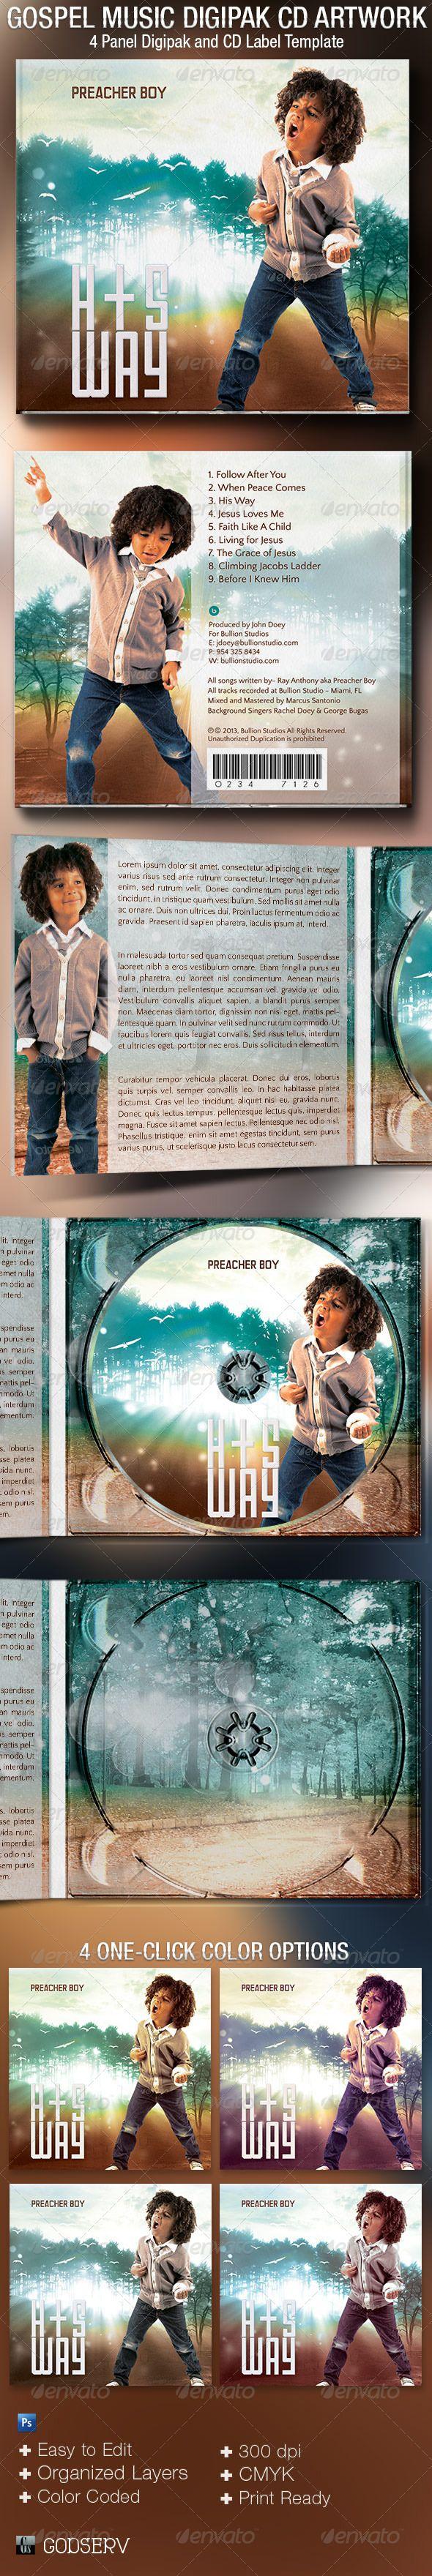 Gospel Music 4 Panel Digipak CD Artwork Template - #CD & #DVD #Artwork Print #Templates Download here: https://graphicriver.net/item/gospel-music-4-panel-digipak-cd-artwork-template/5378136?ref=alena994